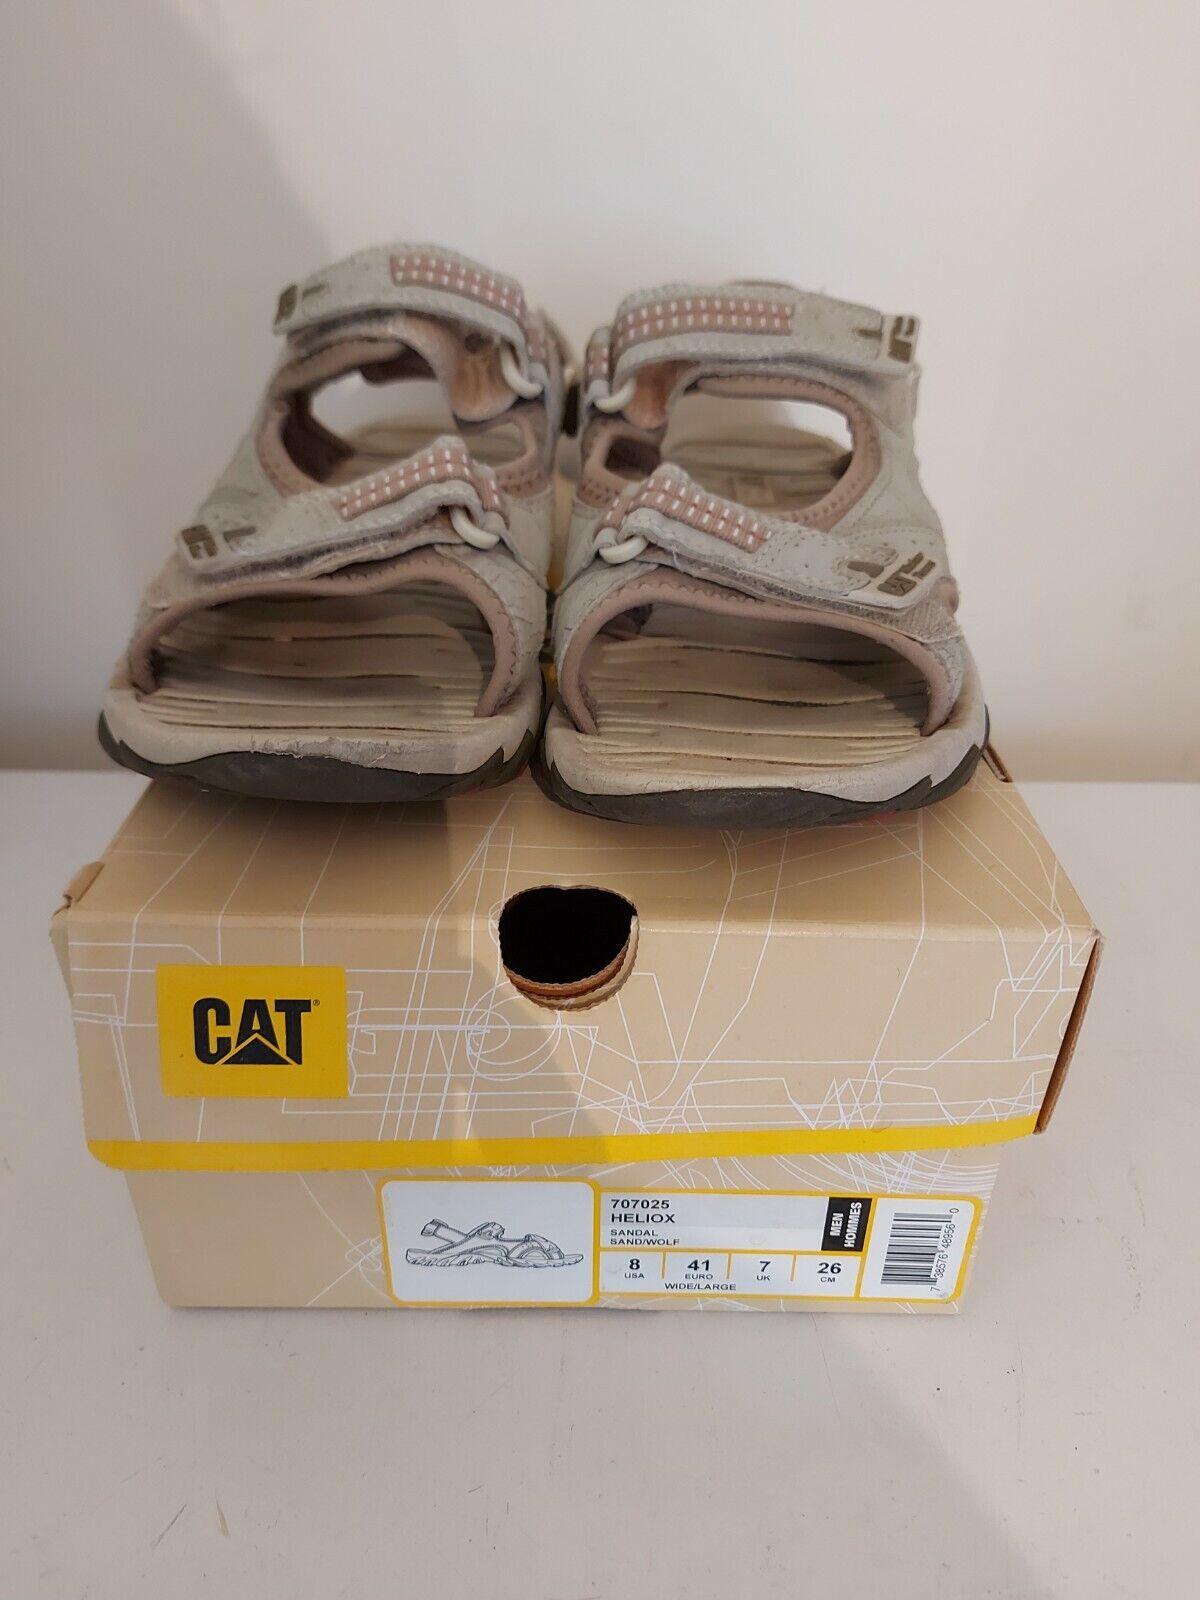 Catterpillar Sandals Heliox uk size 7 boxed